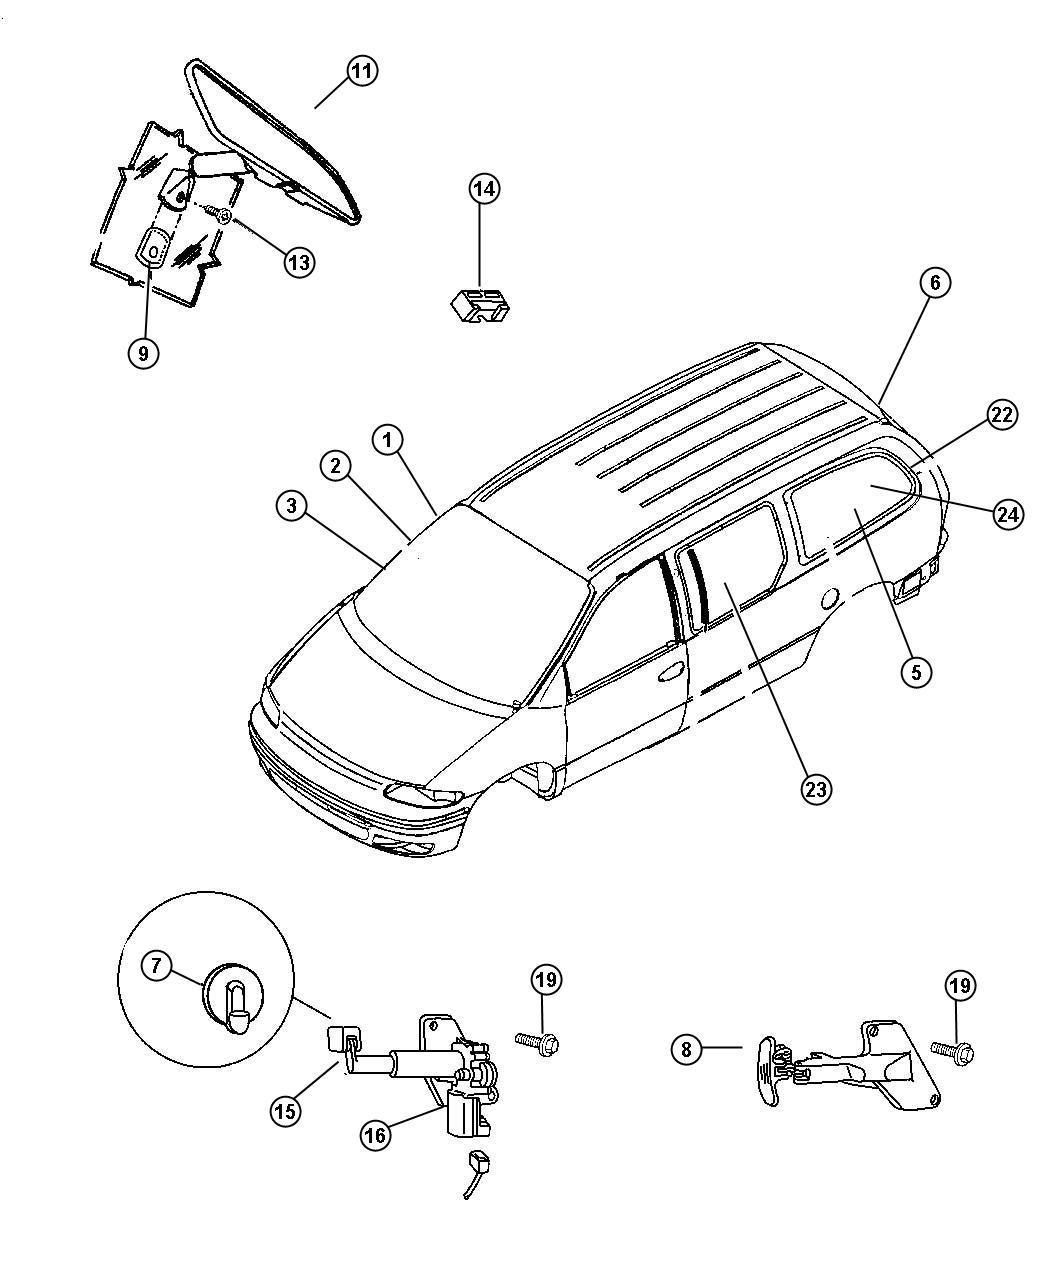 Chrysler Grand Voyager 2 8 Crd User Manual